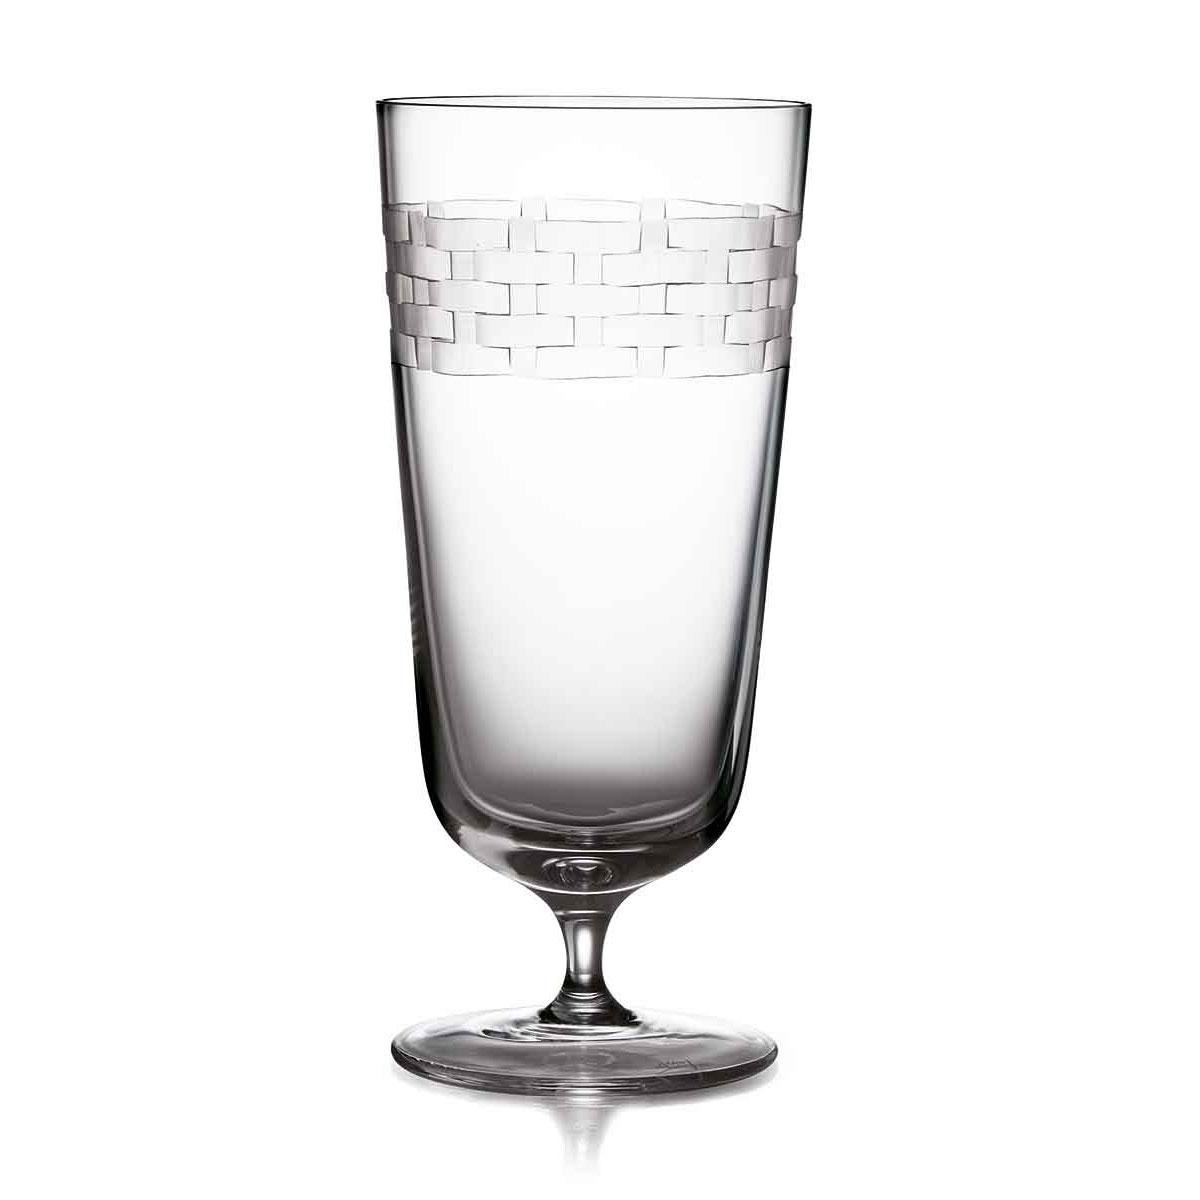 Michael Aram, Palm Ice Tea Glass, Single